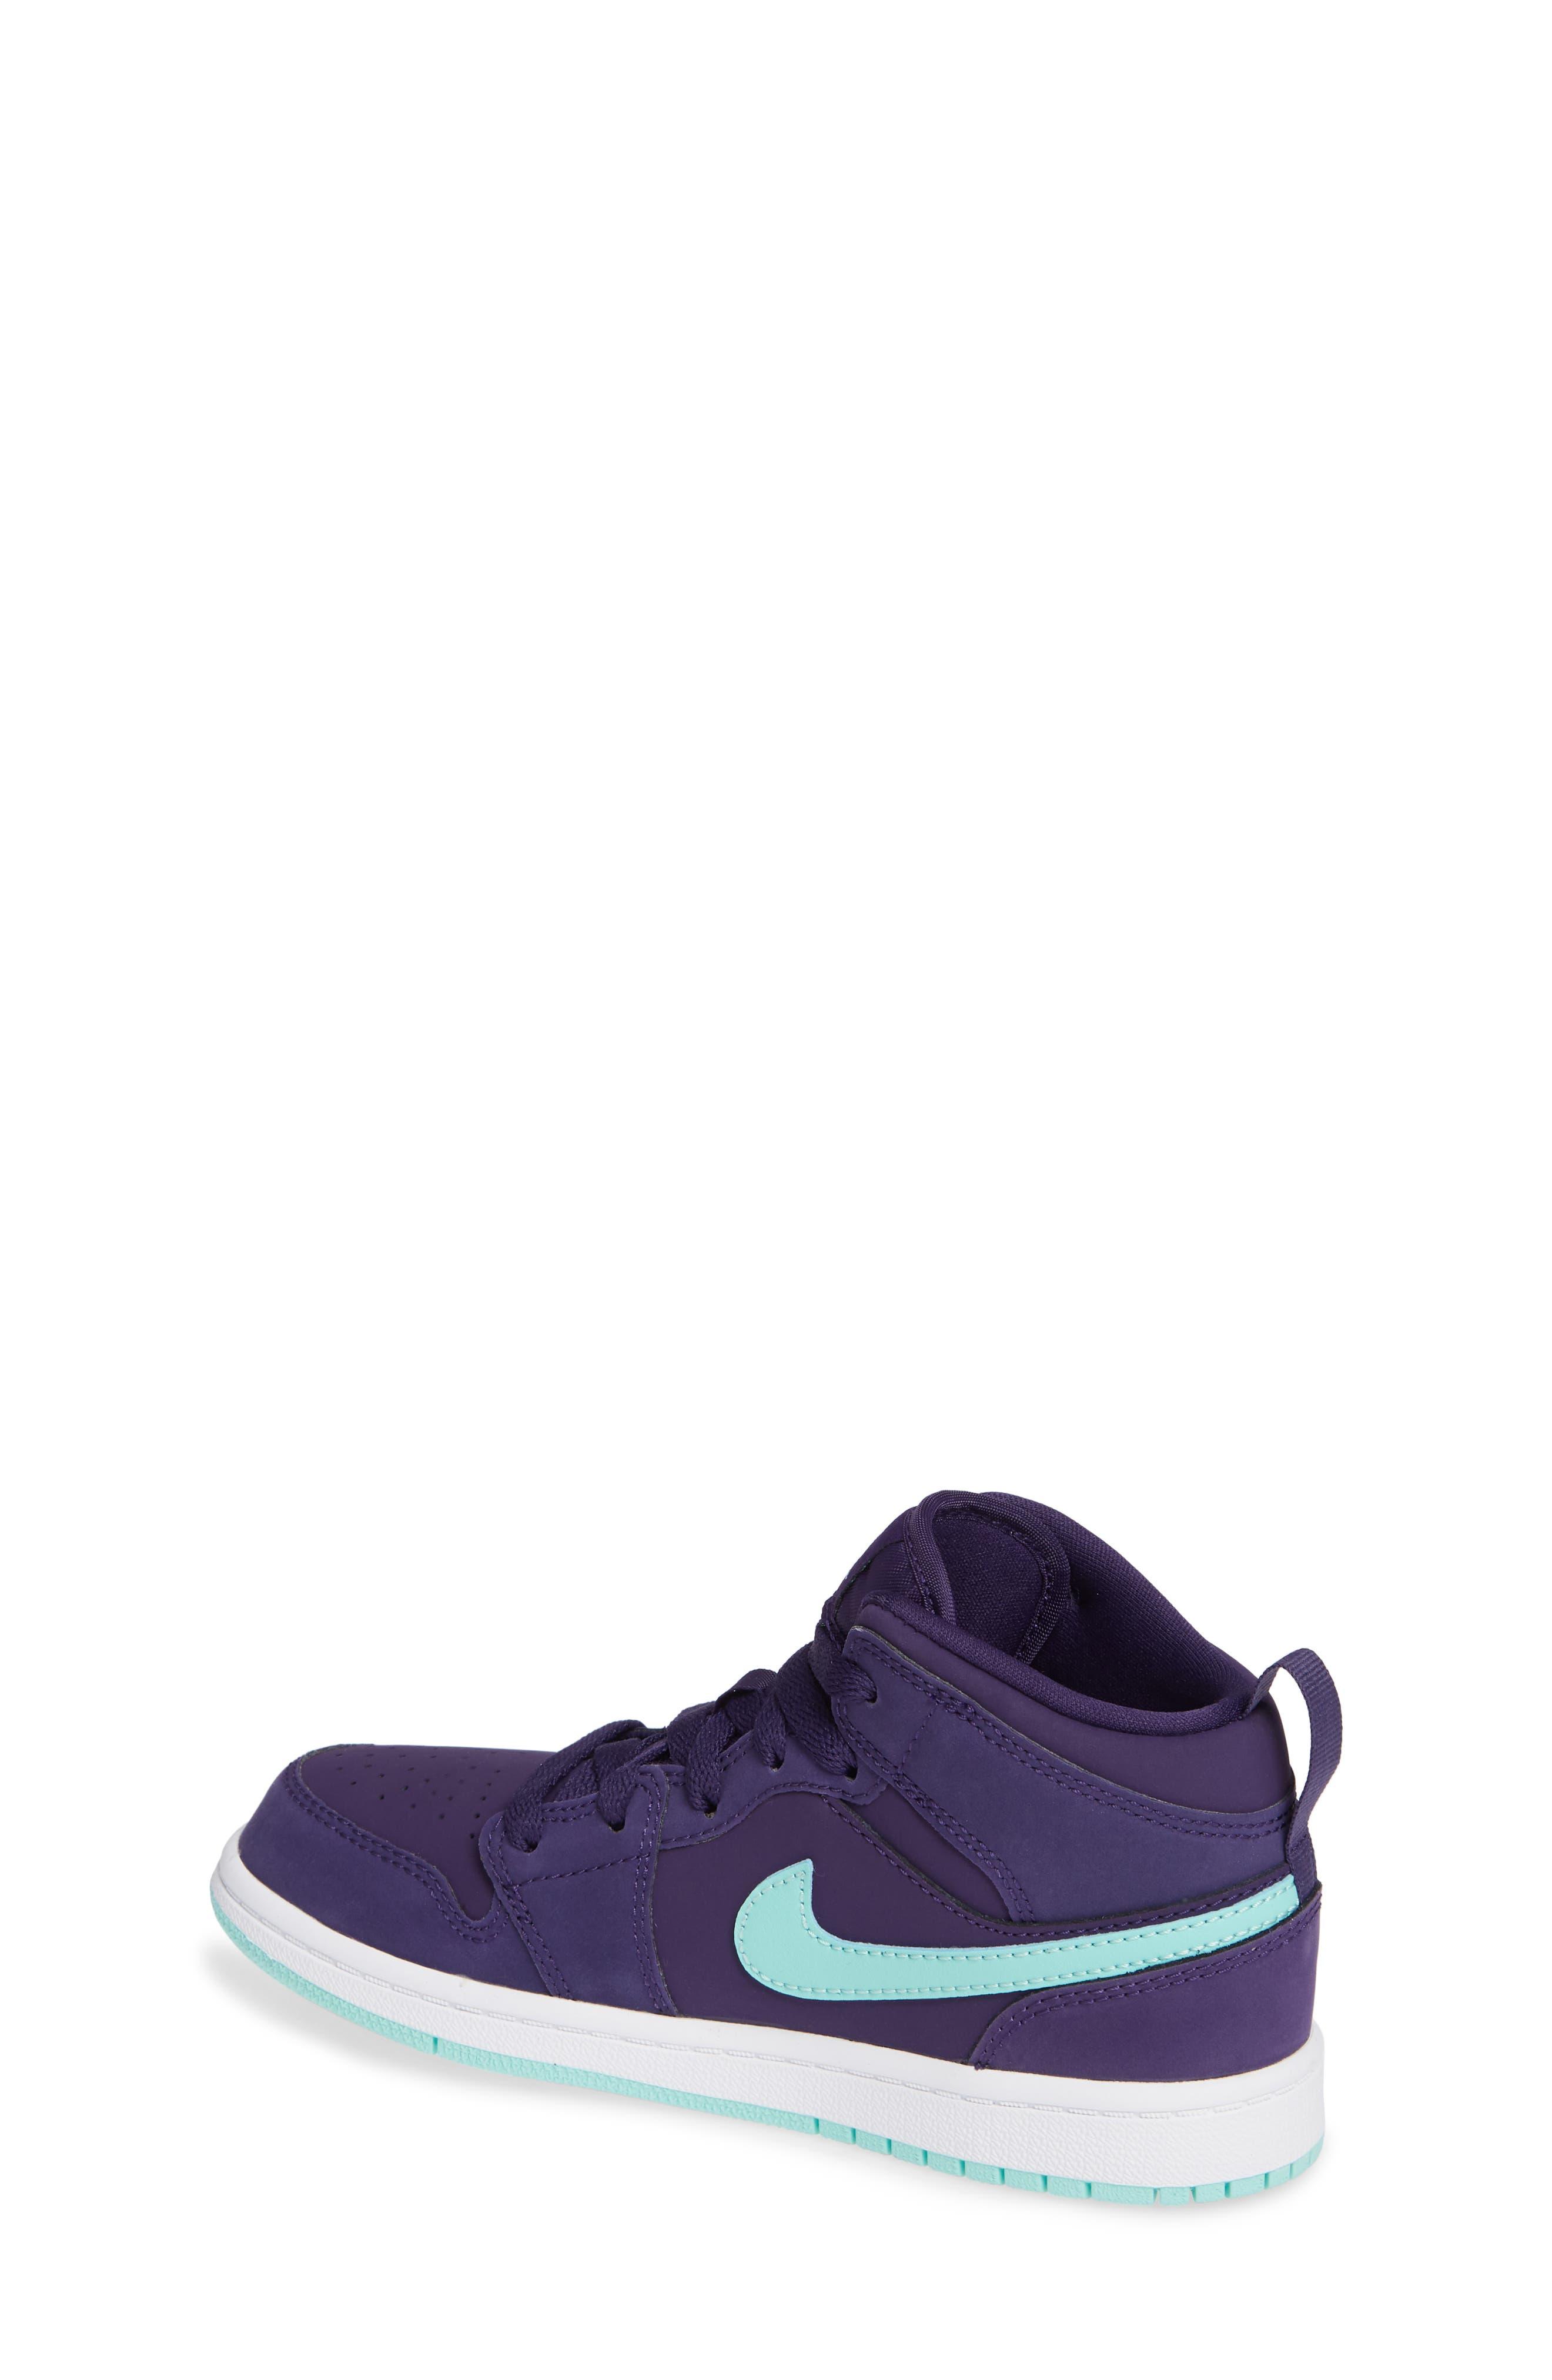 Nike 'Jordan 1 Mid' Basketball Shoe,                             Alternate thumbnail 2, color,                             INK/ EMERALD RISE/ WHITE